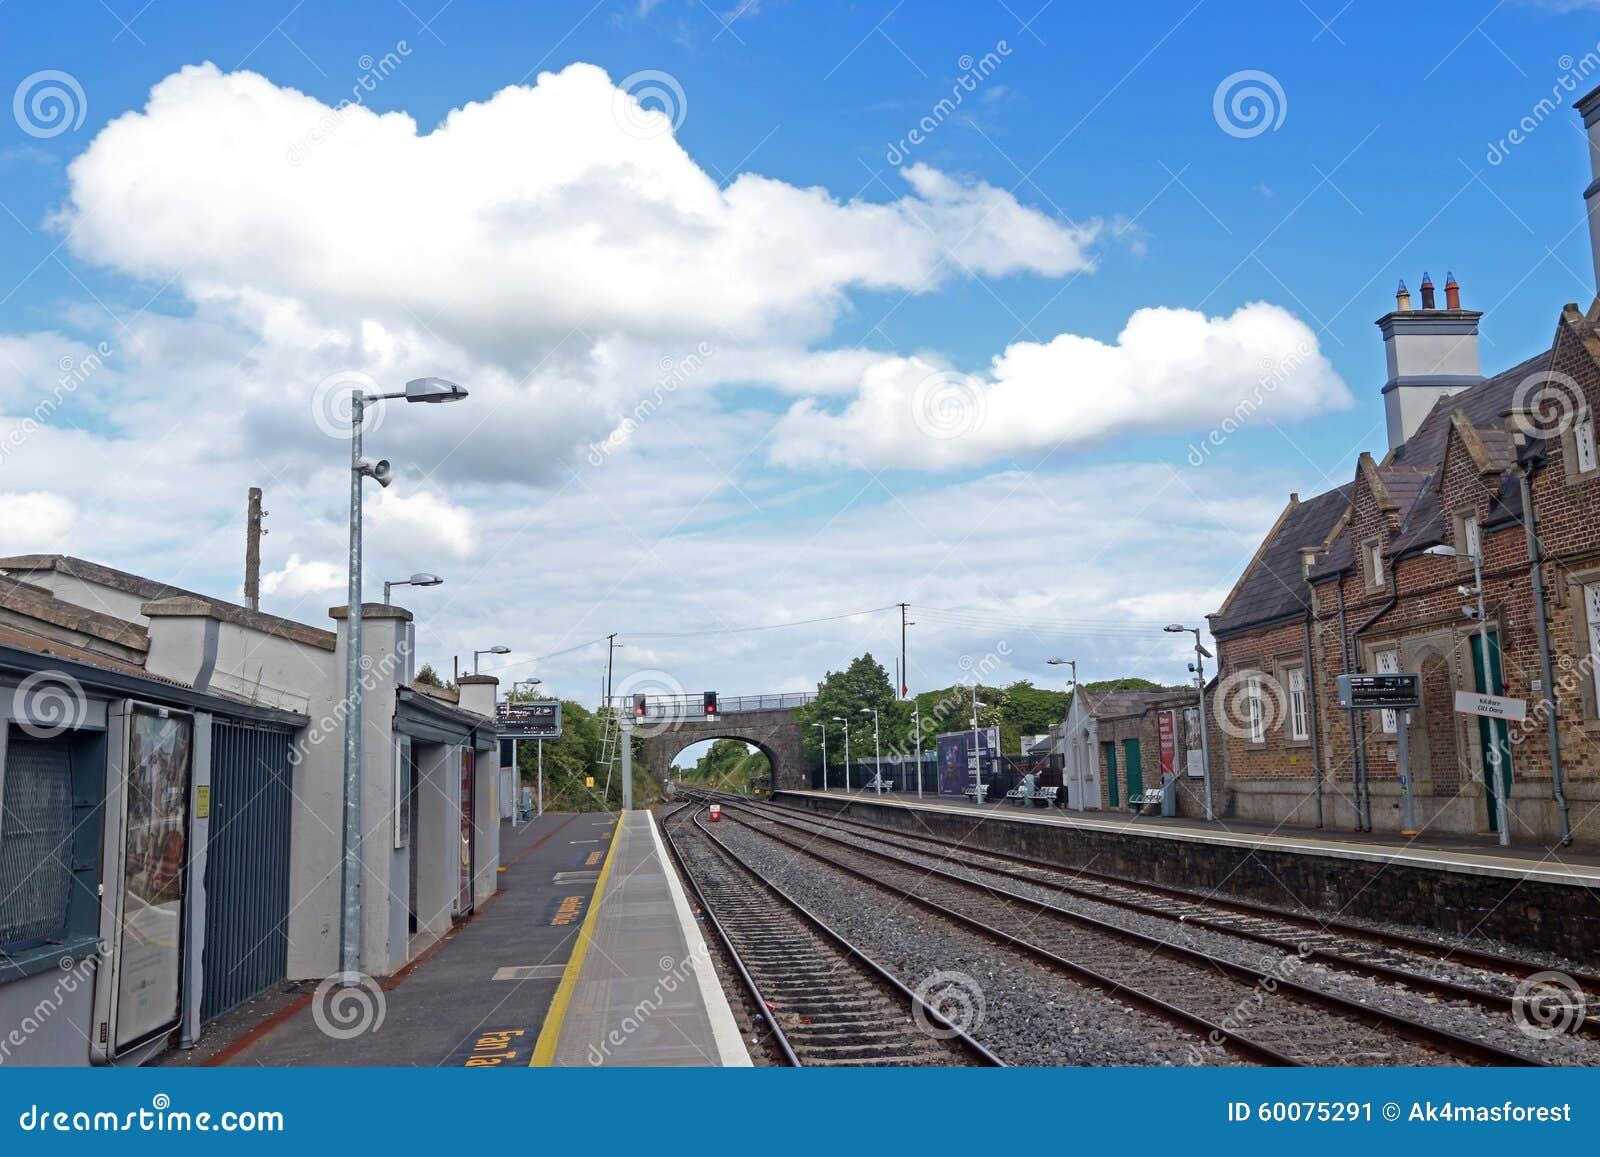 Bahnstationsschienen